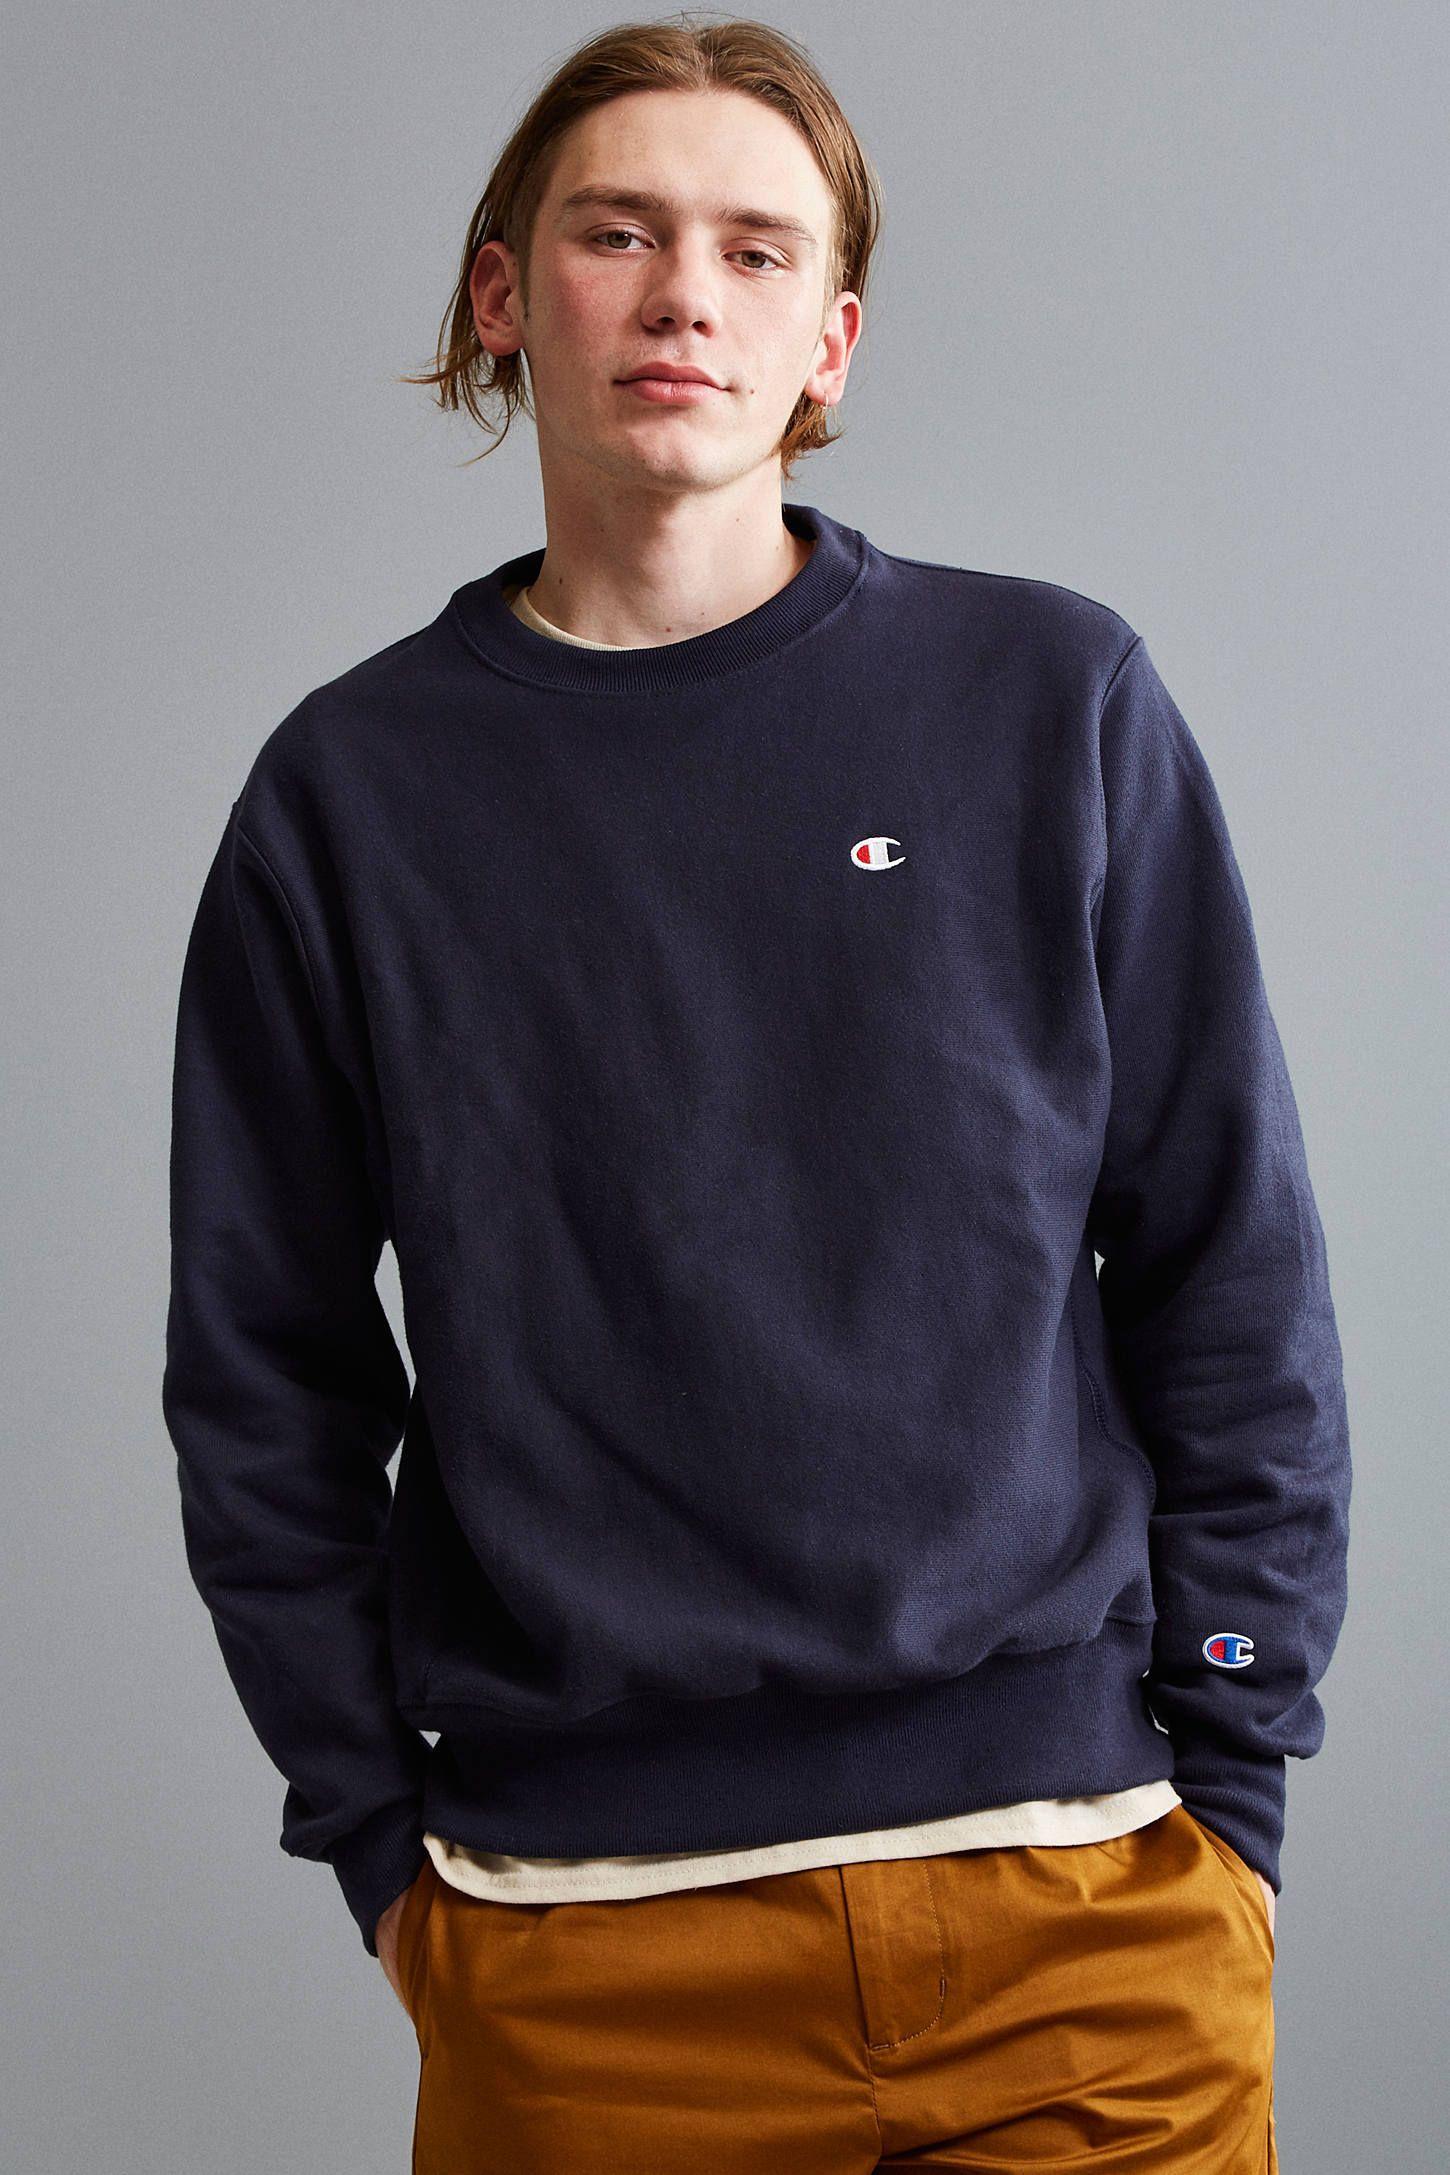 Champion Reverse Weave Fleece Crew Neck Sweatshirt Sweatshirt Outfit Men Crewneck Sweatshirt Outfit Mens Outfits [ 2175 x 1450 Pixel ]